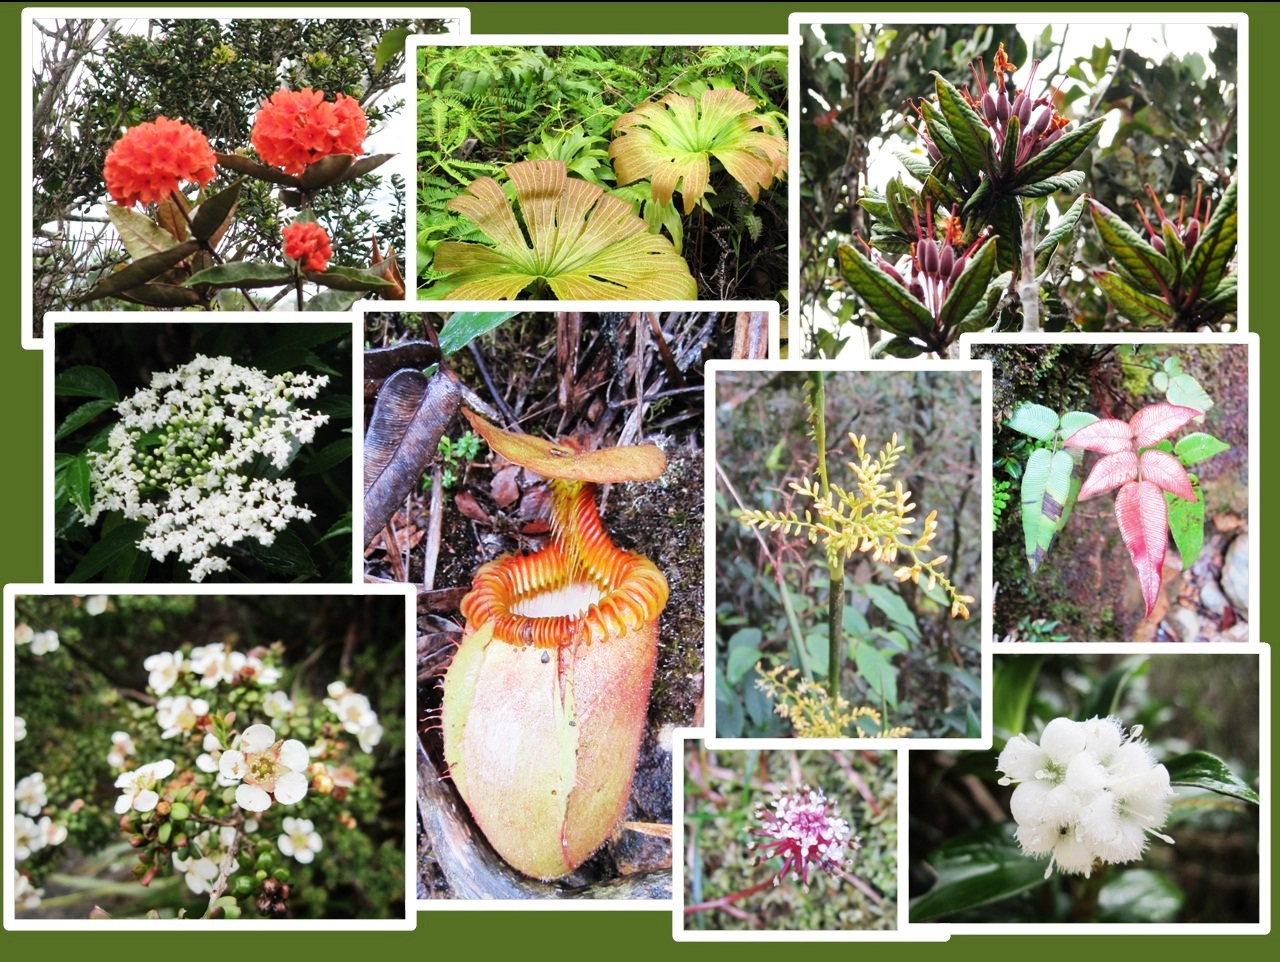 The flora of Mt. Kinabalu, mt kinabalu plants, mt kinabalu flowers, mt kinabalu trail, mt kinabalu itinerary, kota kinabalu plants